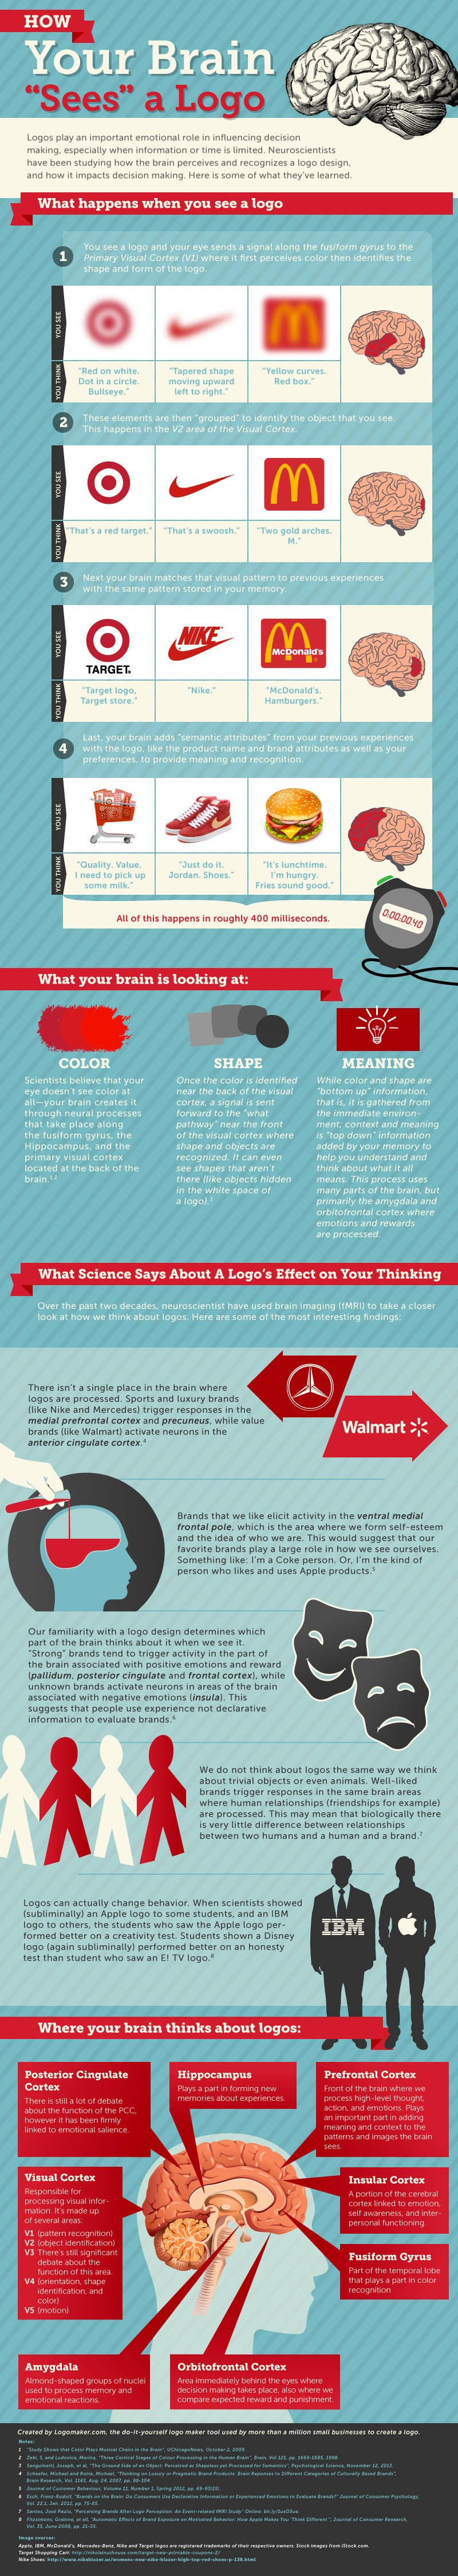 infografia Como relaciona tu cerebro los logos